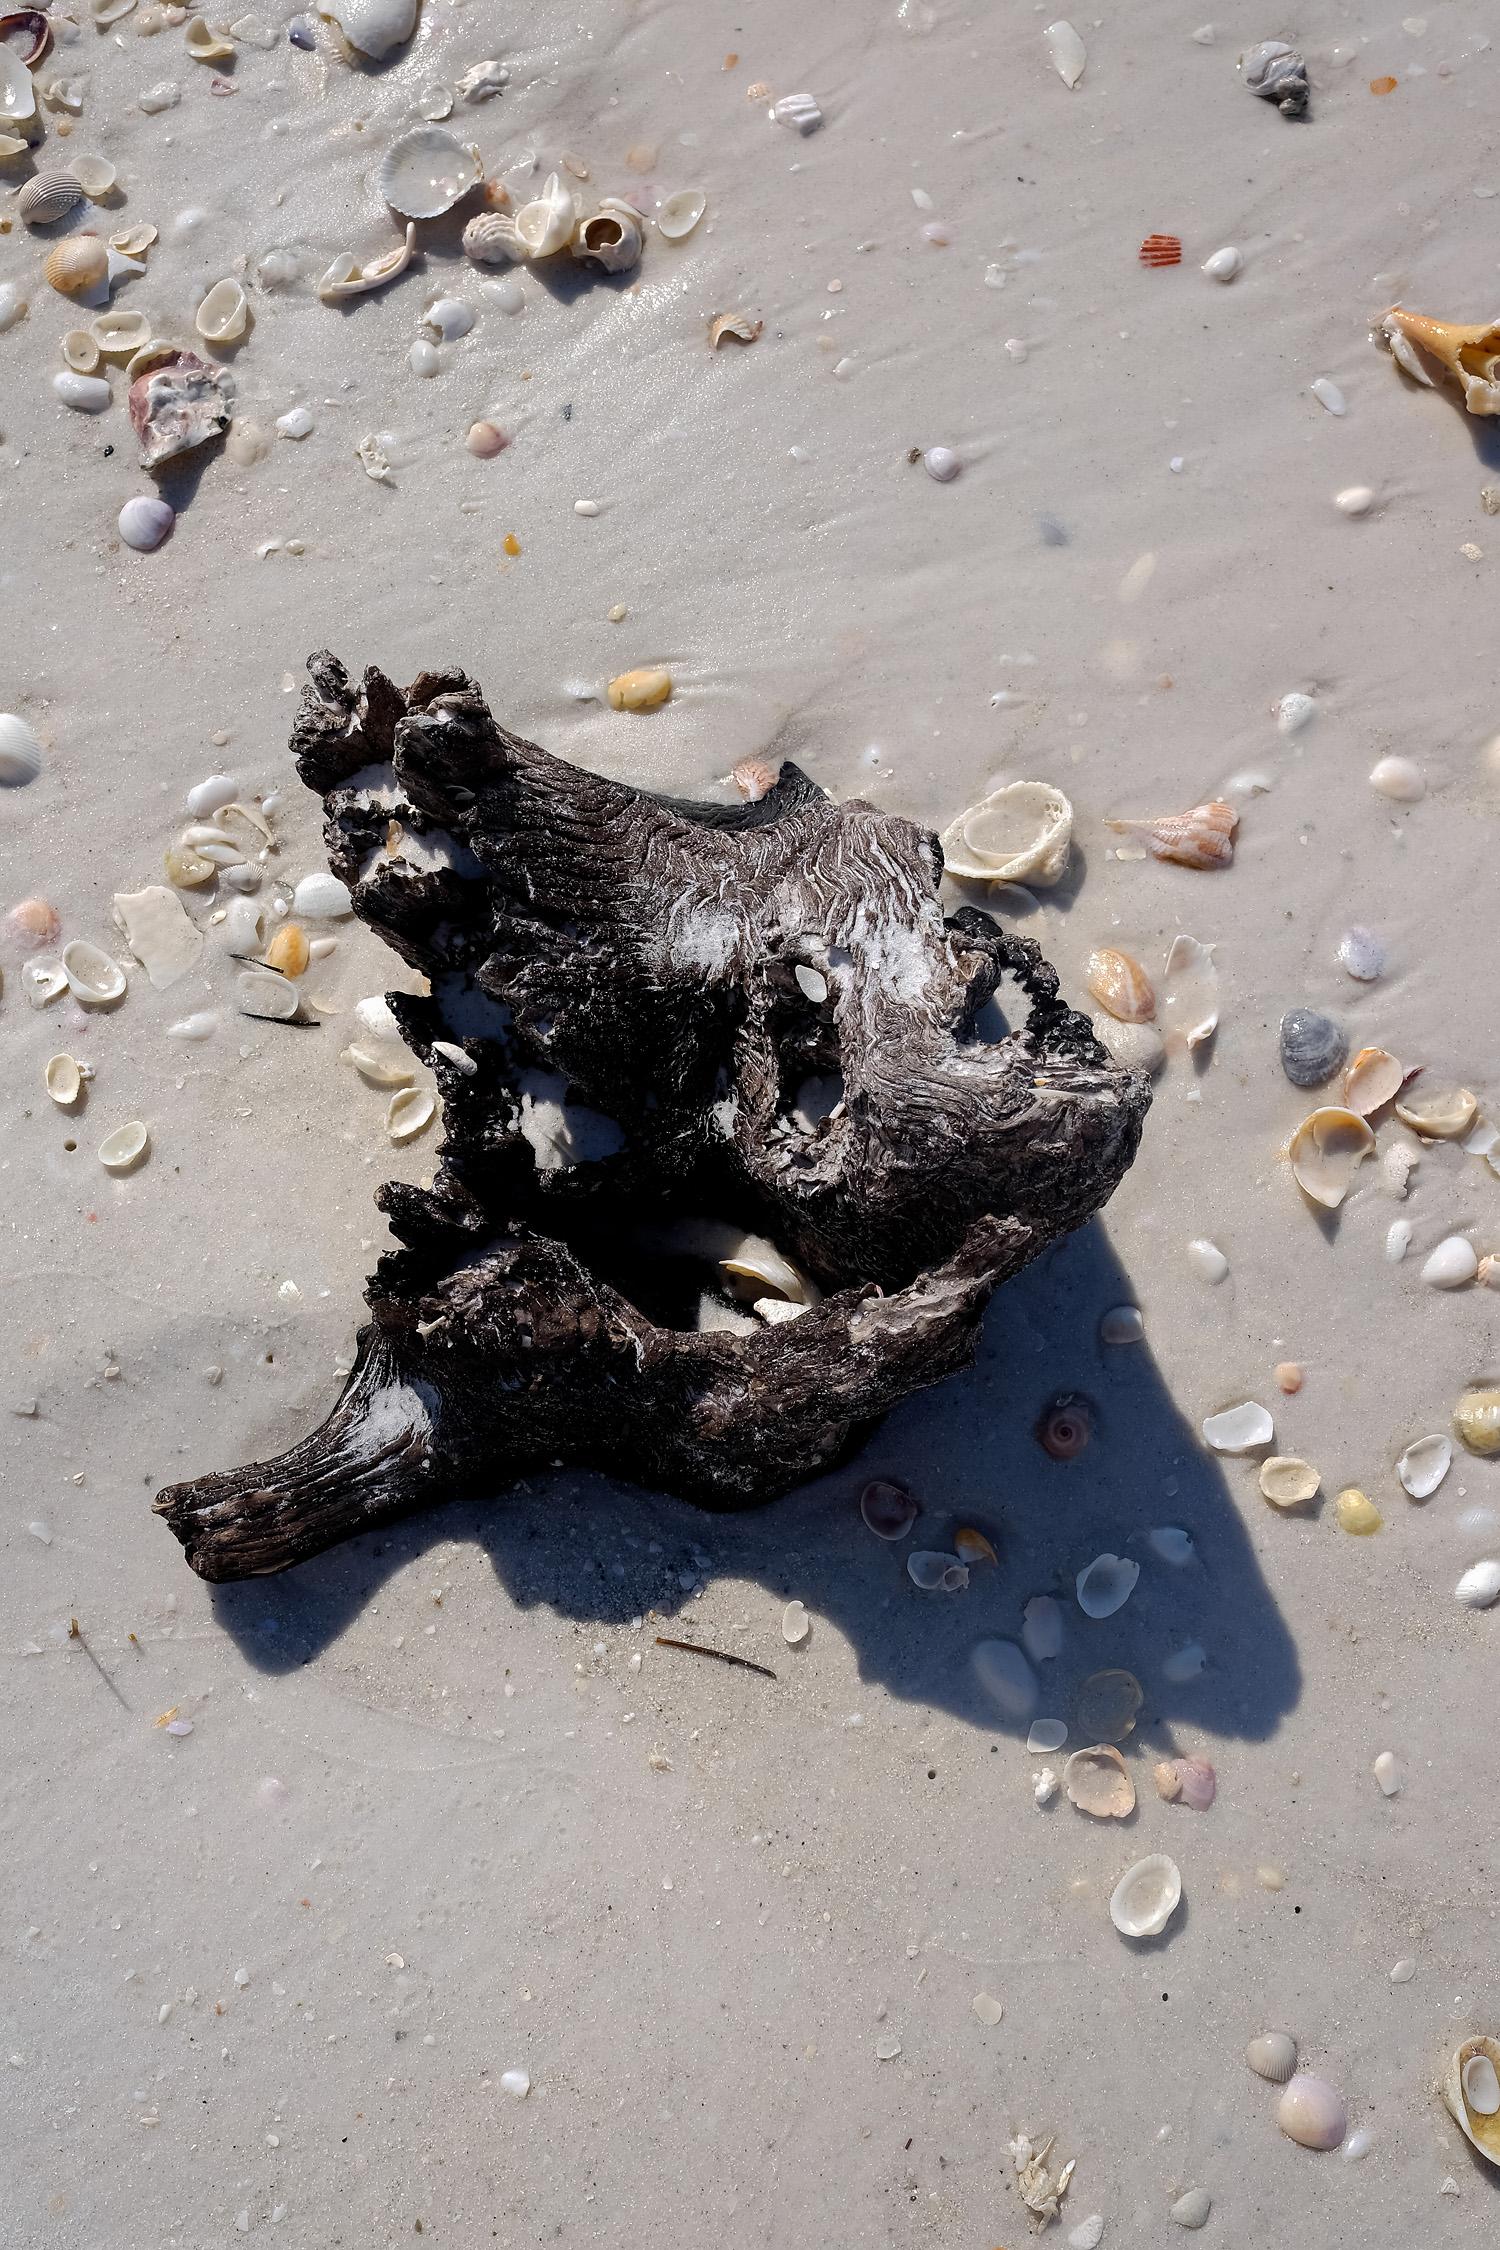 Sarasota beach, the wooden head